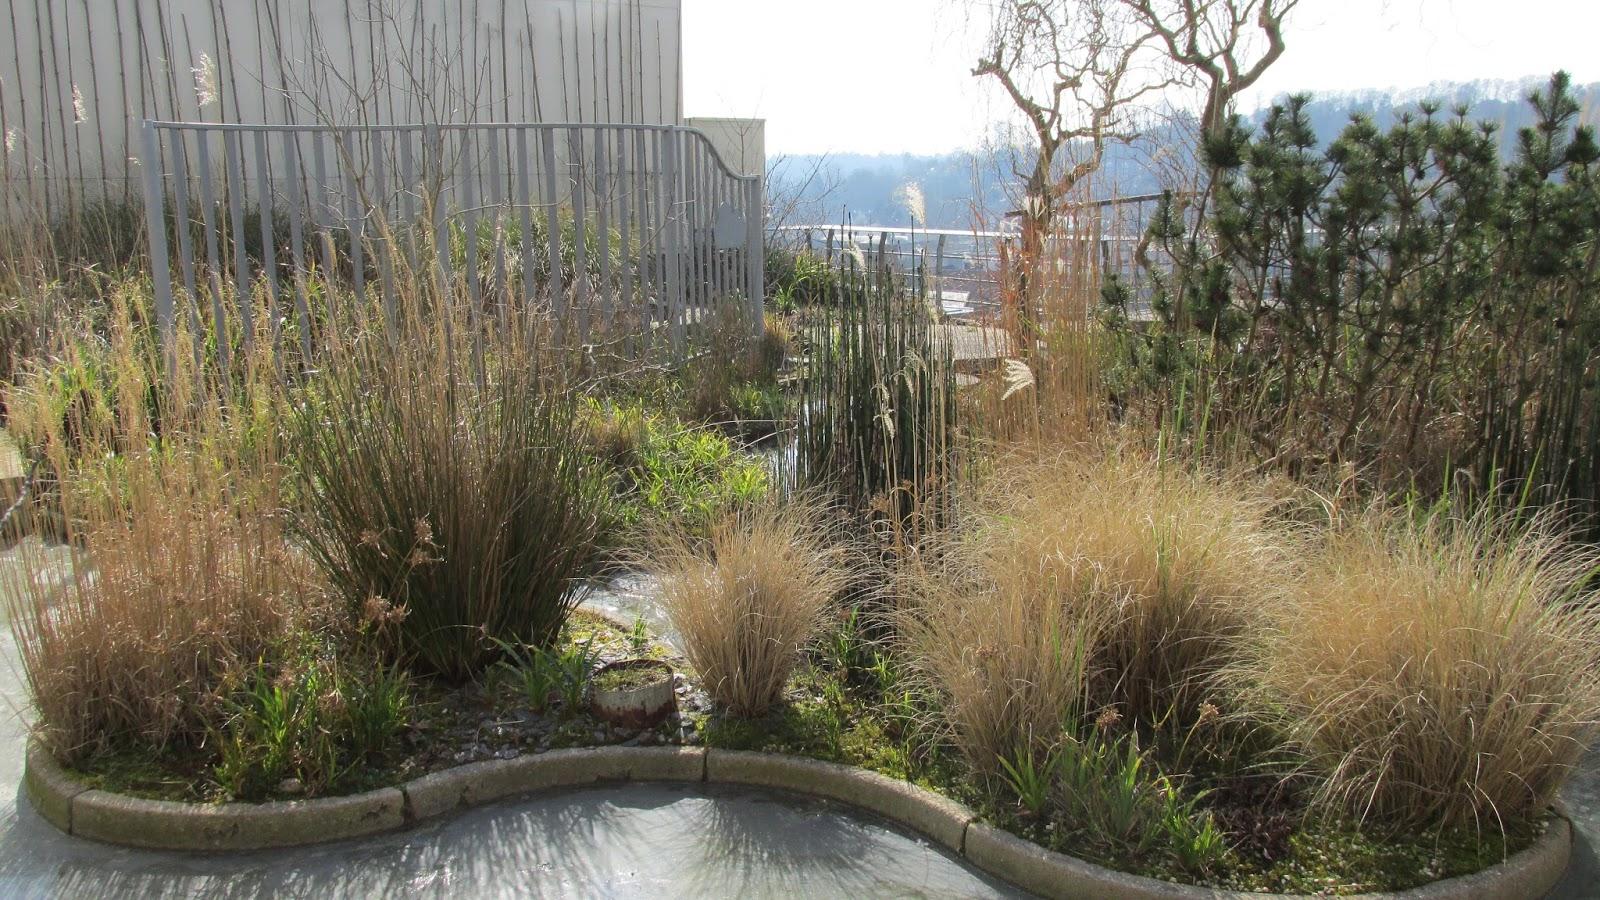 crimson kettle: Parks and Gardens Guildford